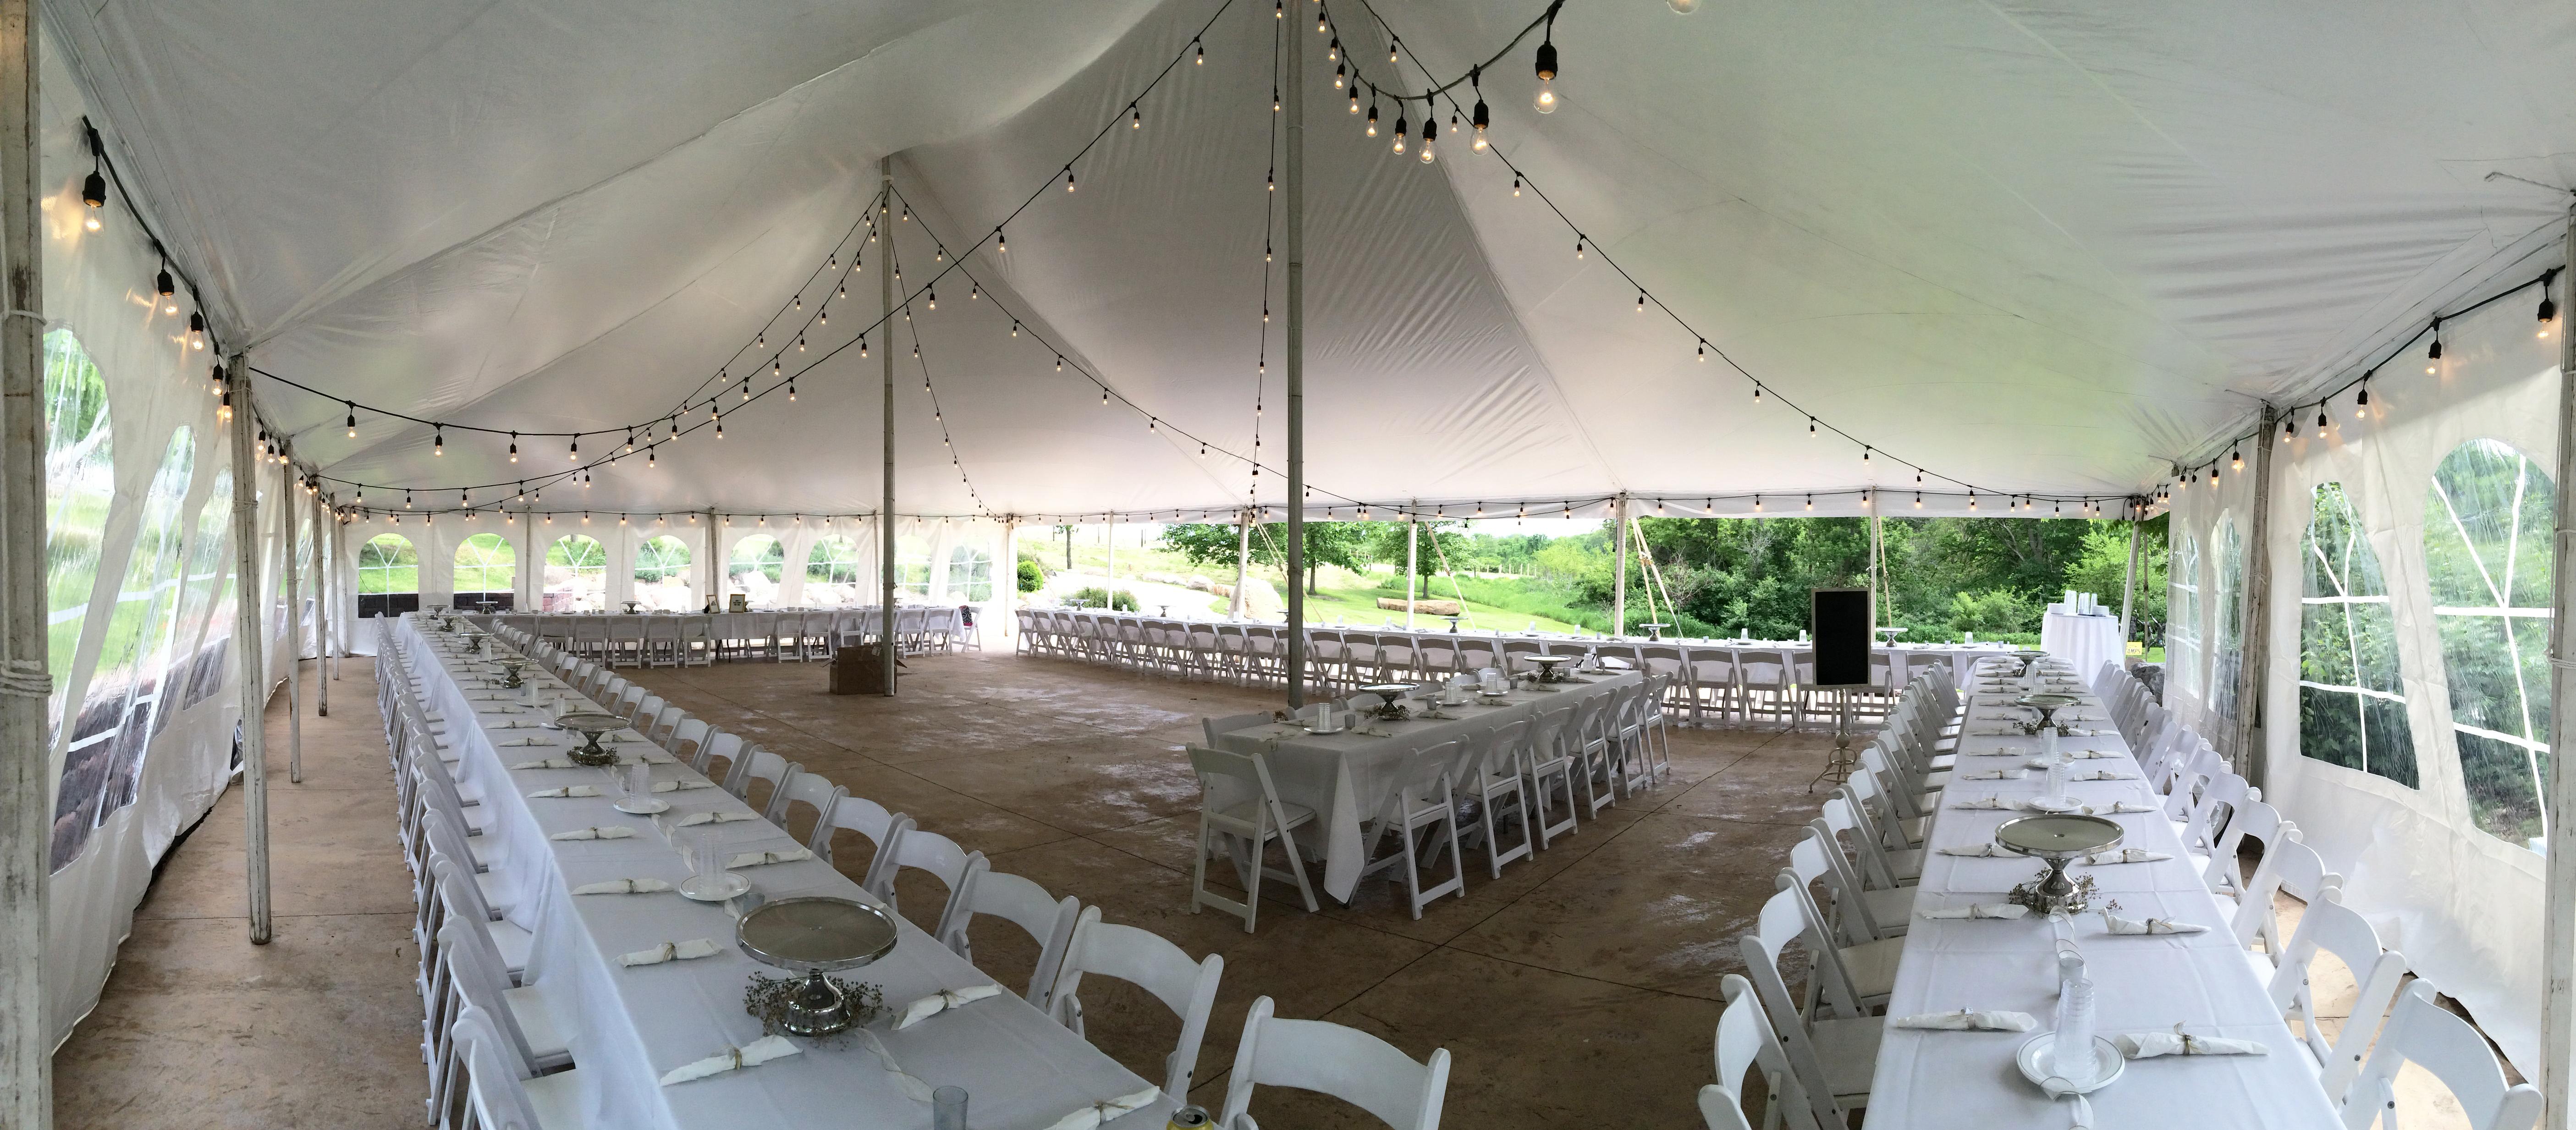 Rent cafe lights/Edison light: Iowa Wedding & Event lighting